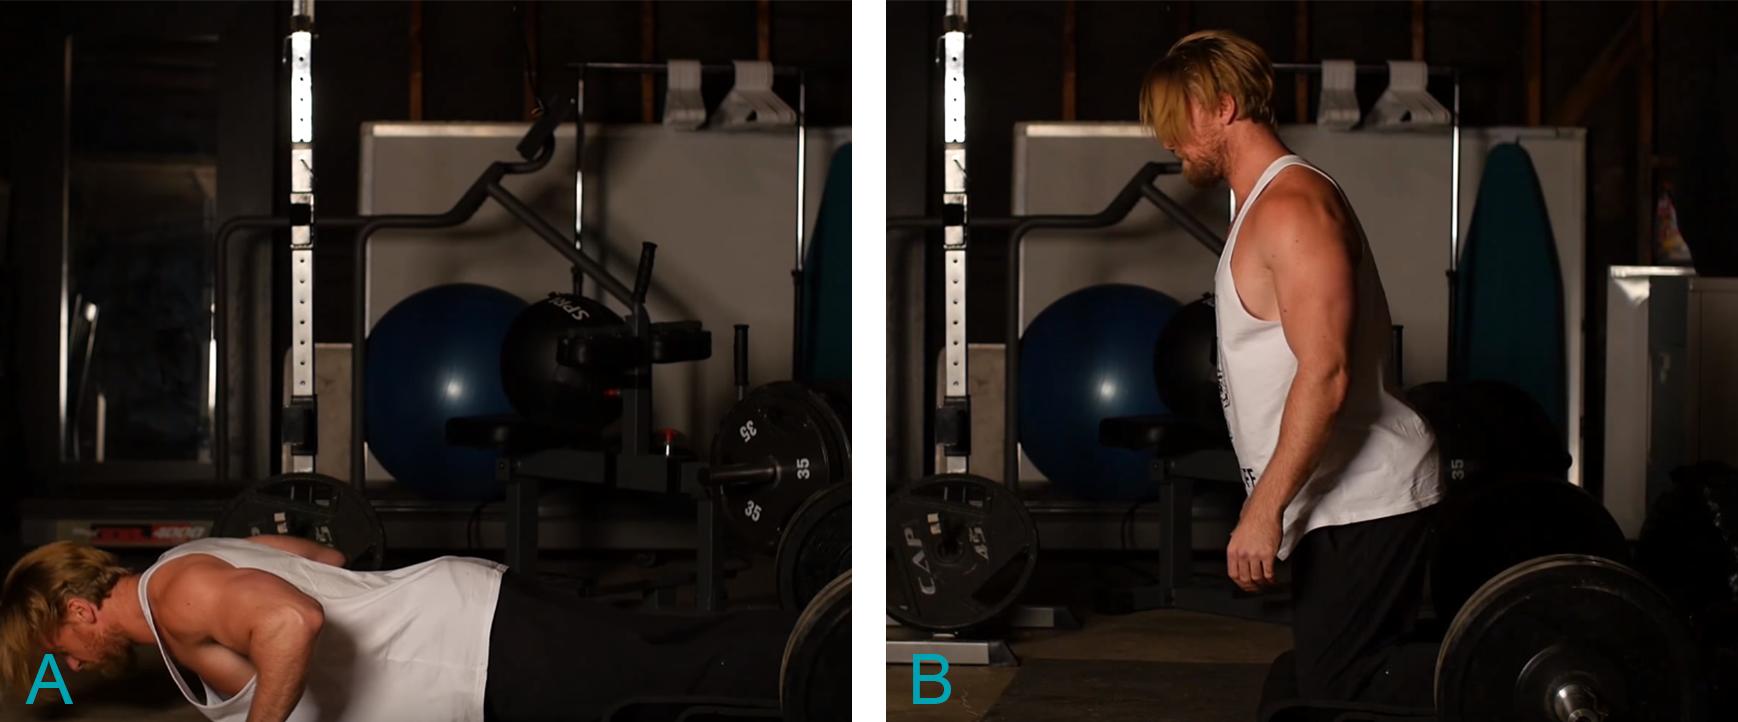 Exercitii acasa pentru masa musculara